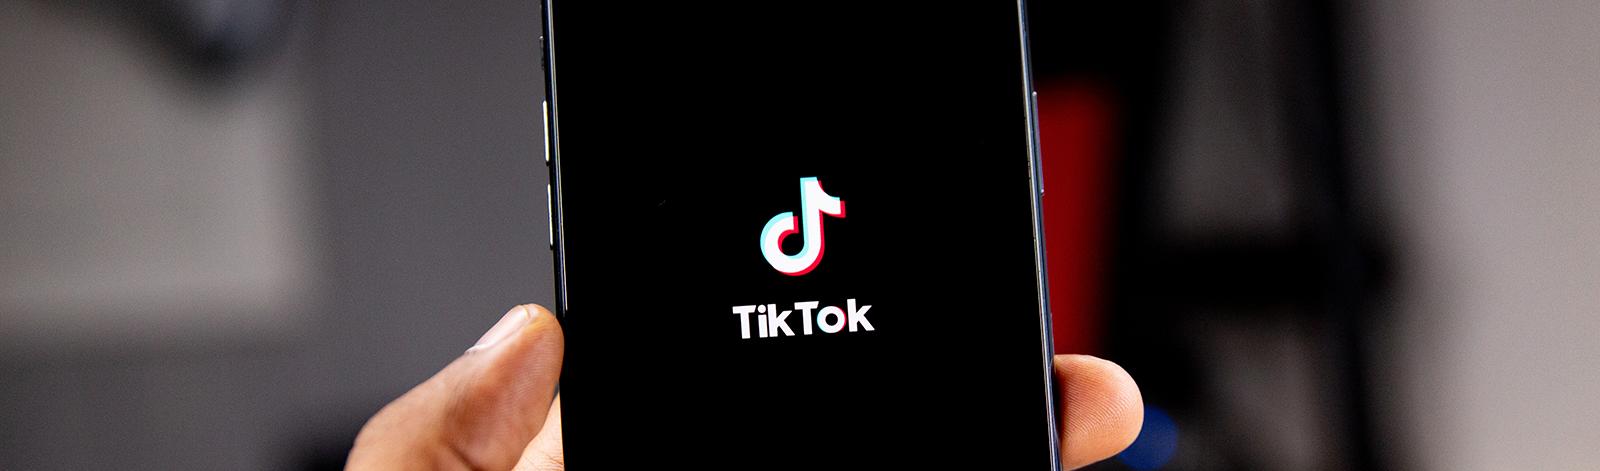 Hand holding smartphone with the TikTok app